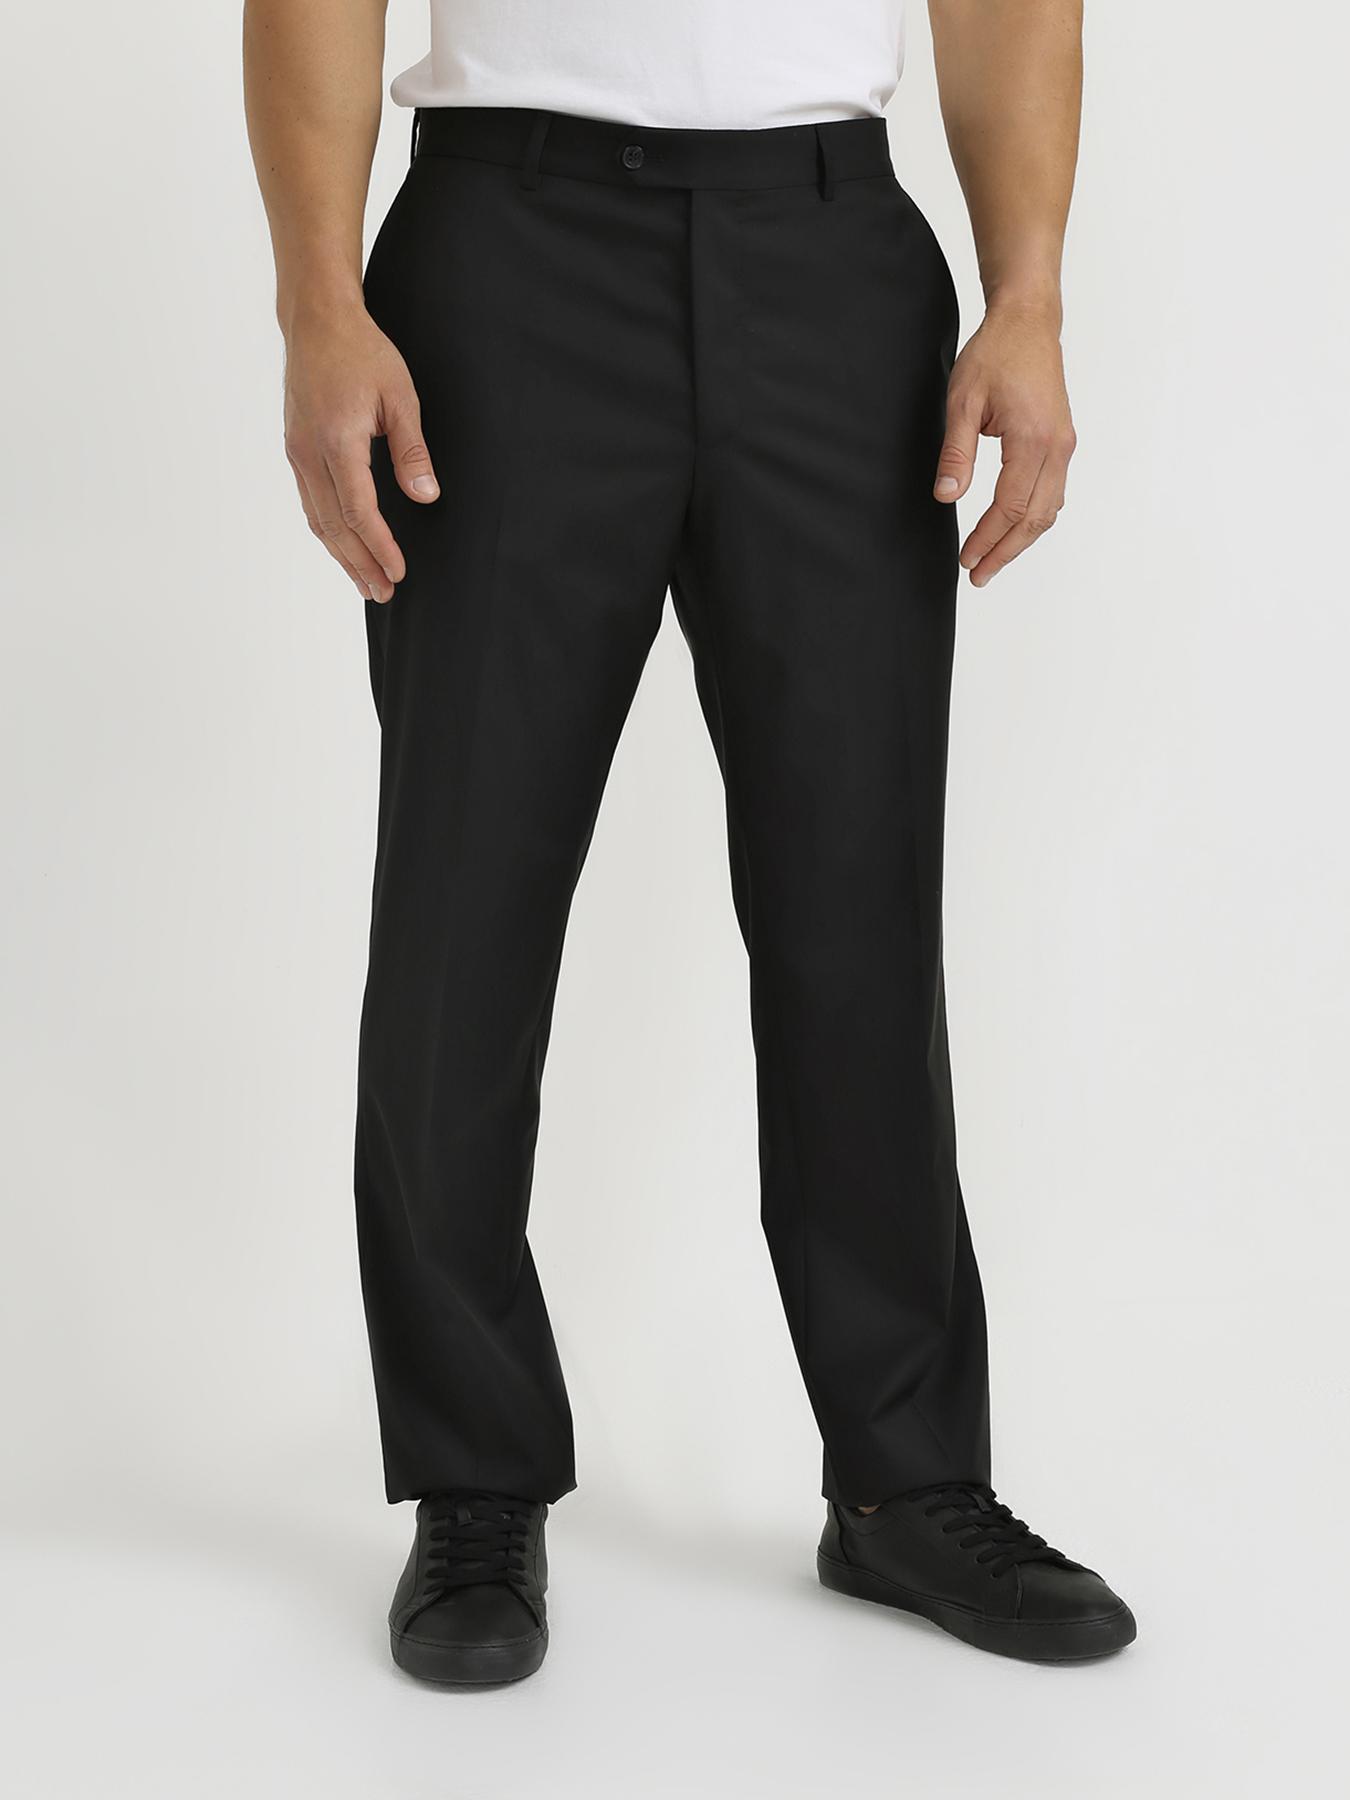 Брюки Korpo Классические брюки